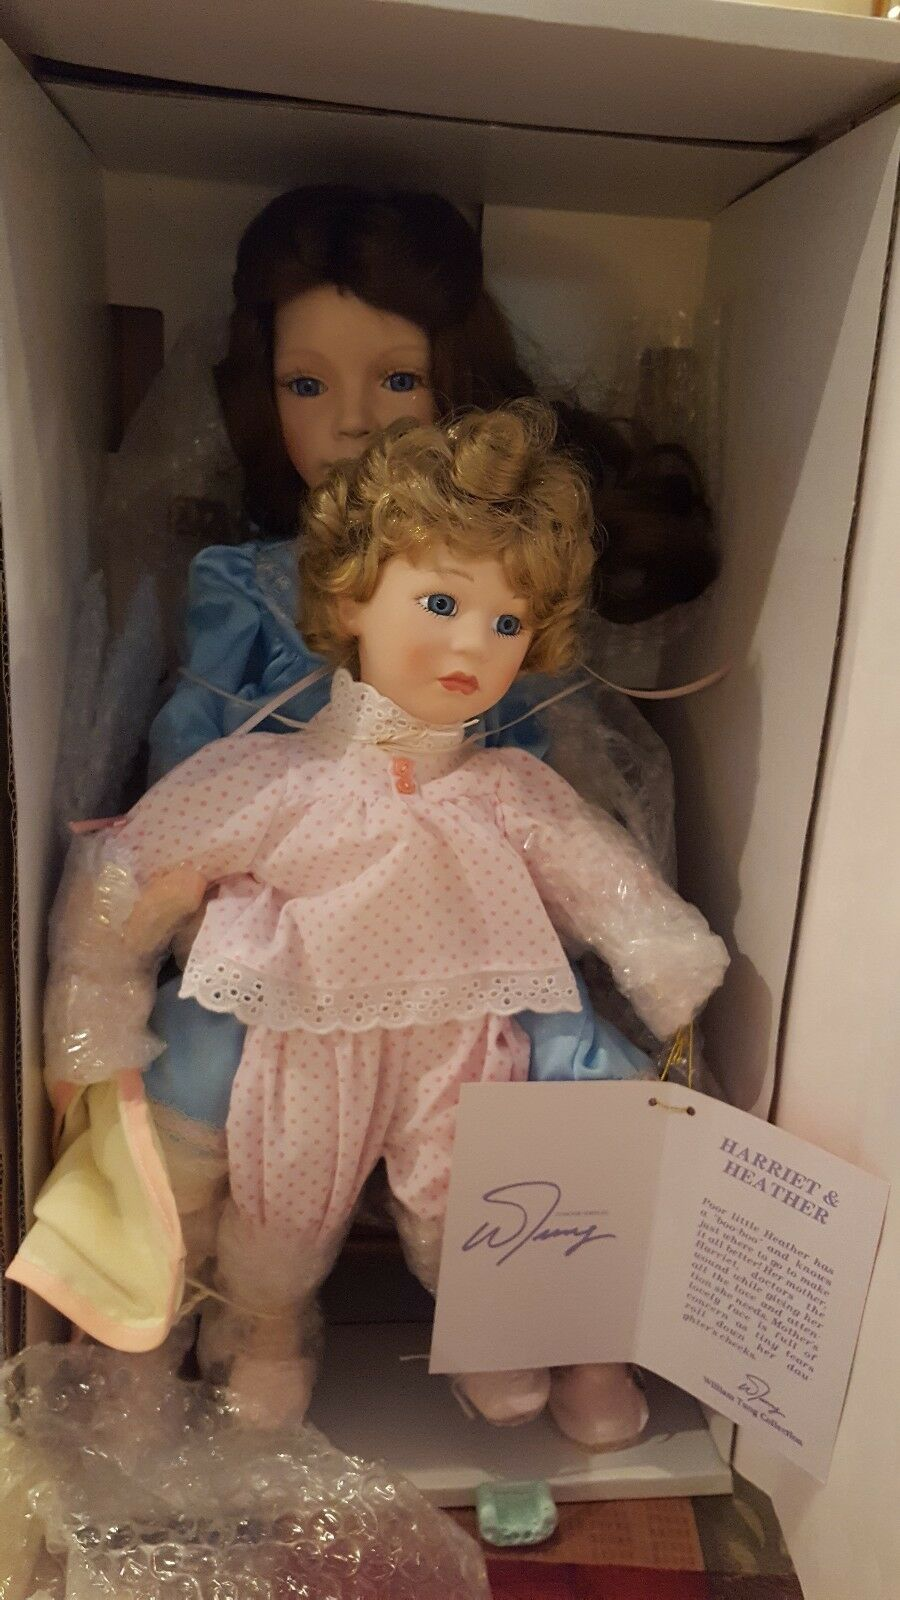 William Tung Porcelain Doll Harriet and Heather.  Dolls Pristine w/ Accessories